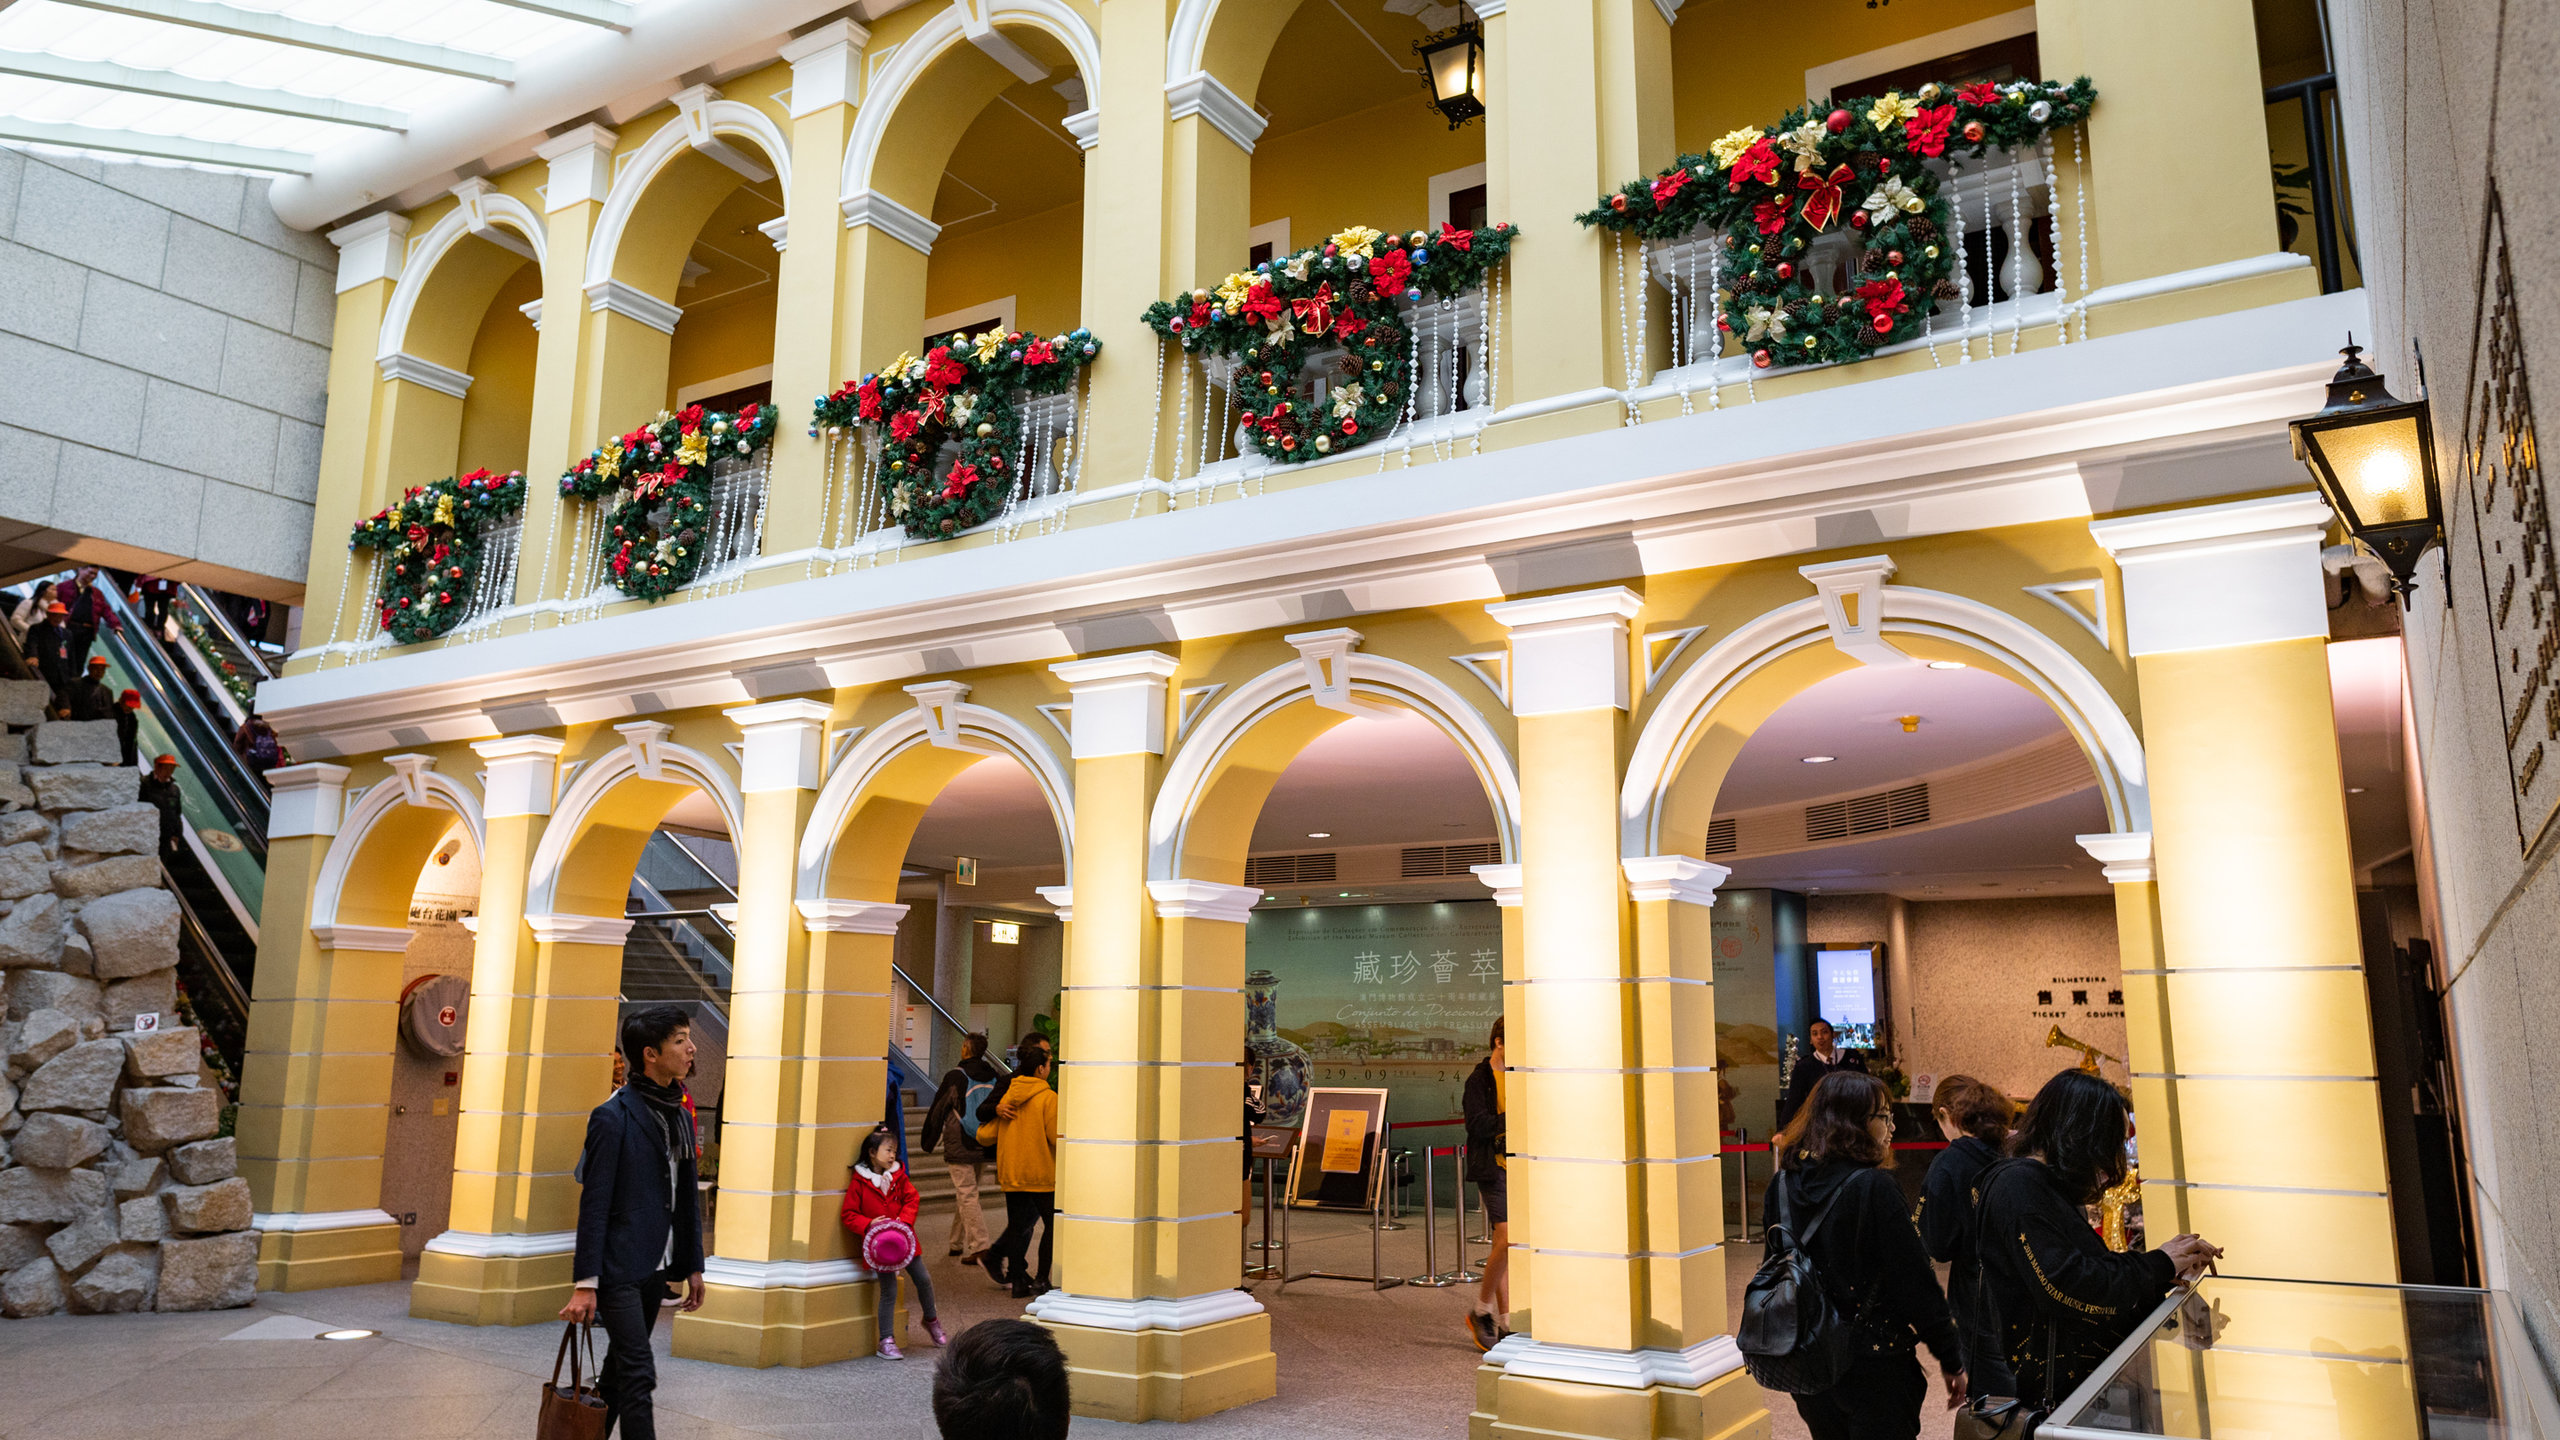 Anda dapat mencari tahu mengenai pameran di Museum Makau, museum yang memiliki kisah sejarah, selama perjalanan Anda ke Pusat Sejarah Macau. Jelajahi pilihan hiburan dan kasino di area kaya budaya ini.